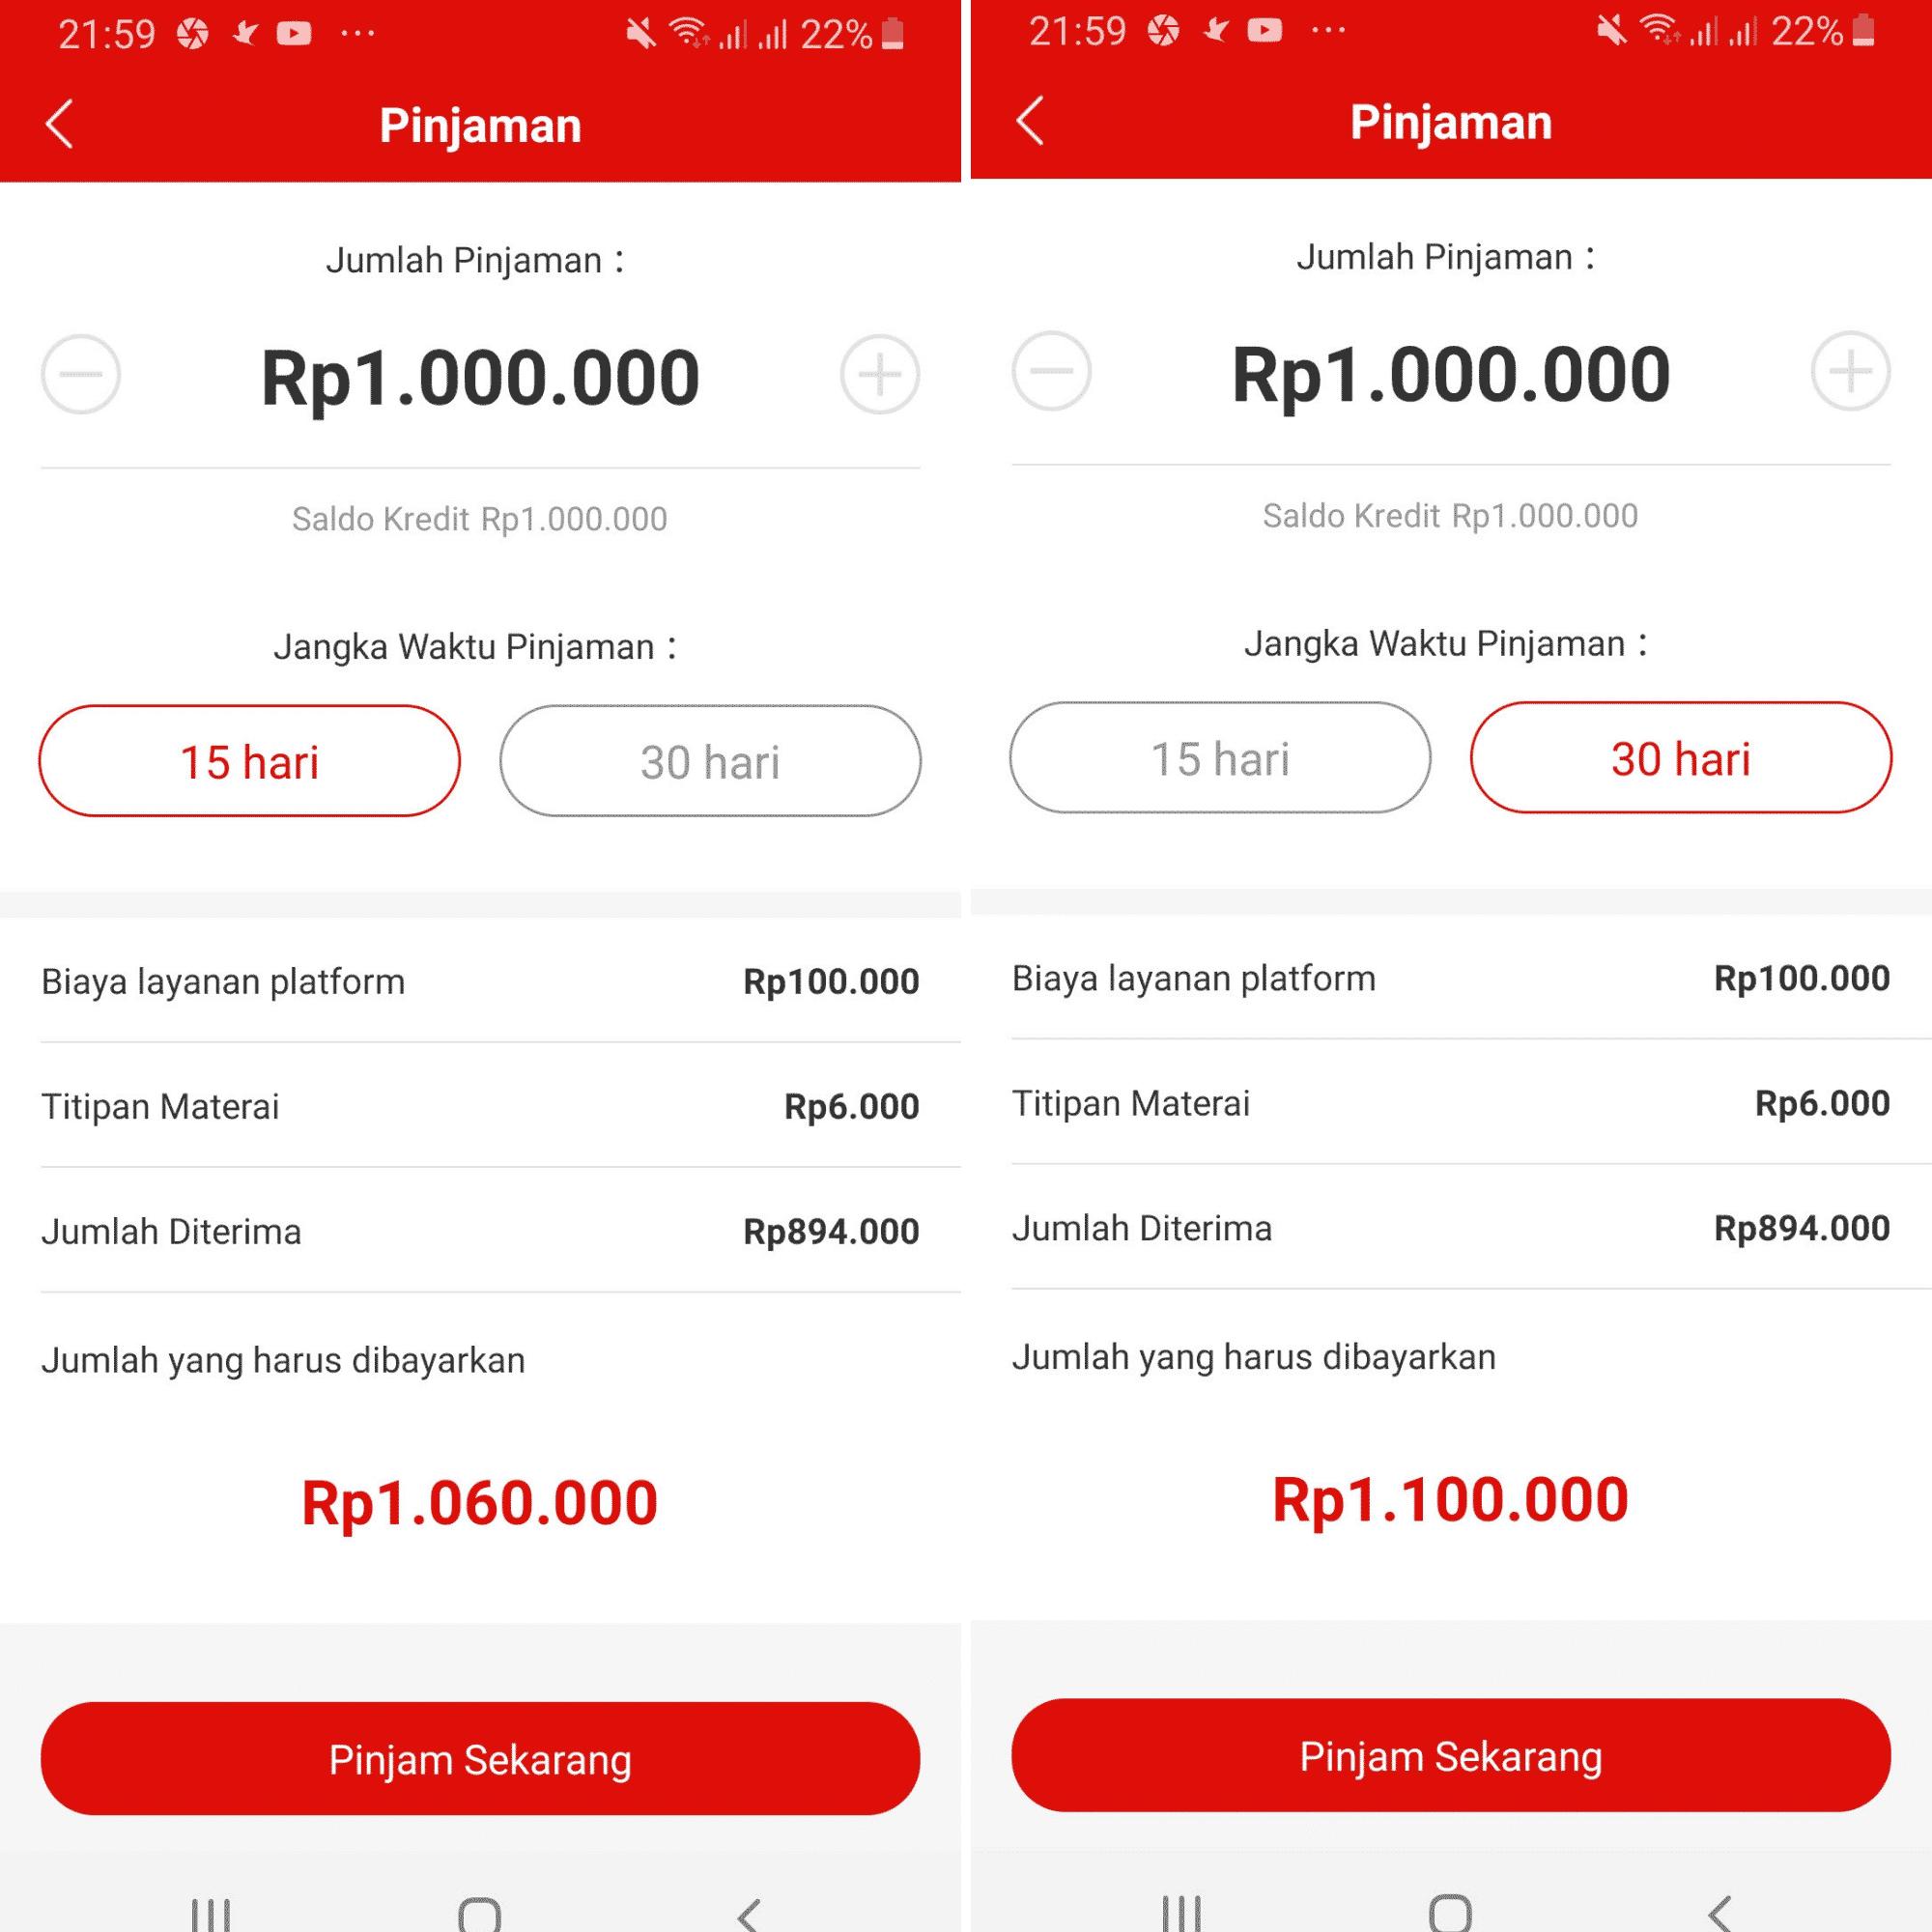 Kreditq Pinjaman Koperasi Online Tanpa Jaminan Pengalaman 2019